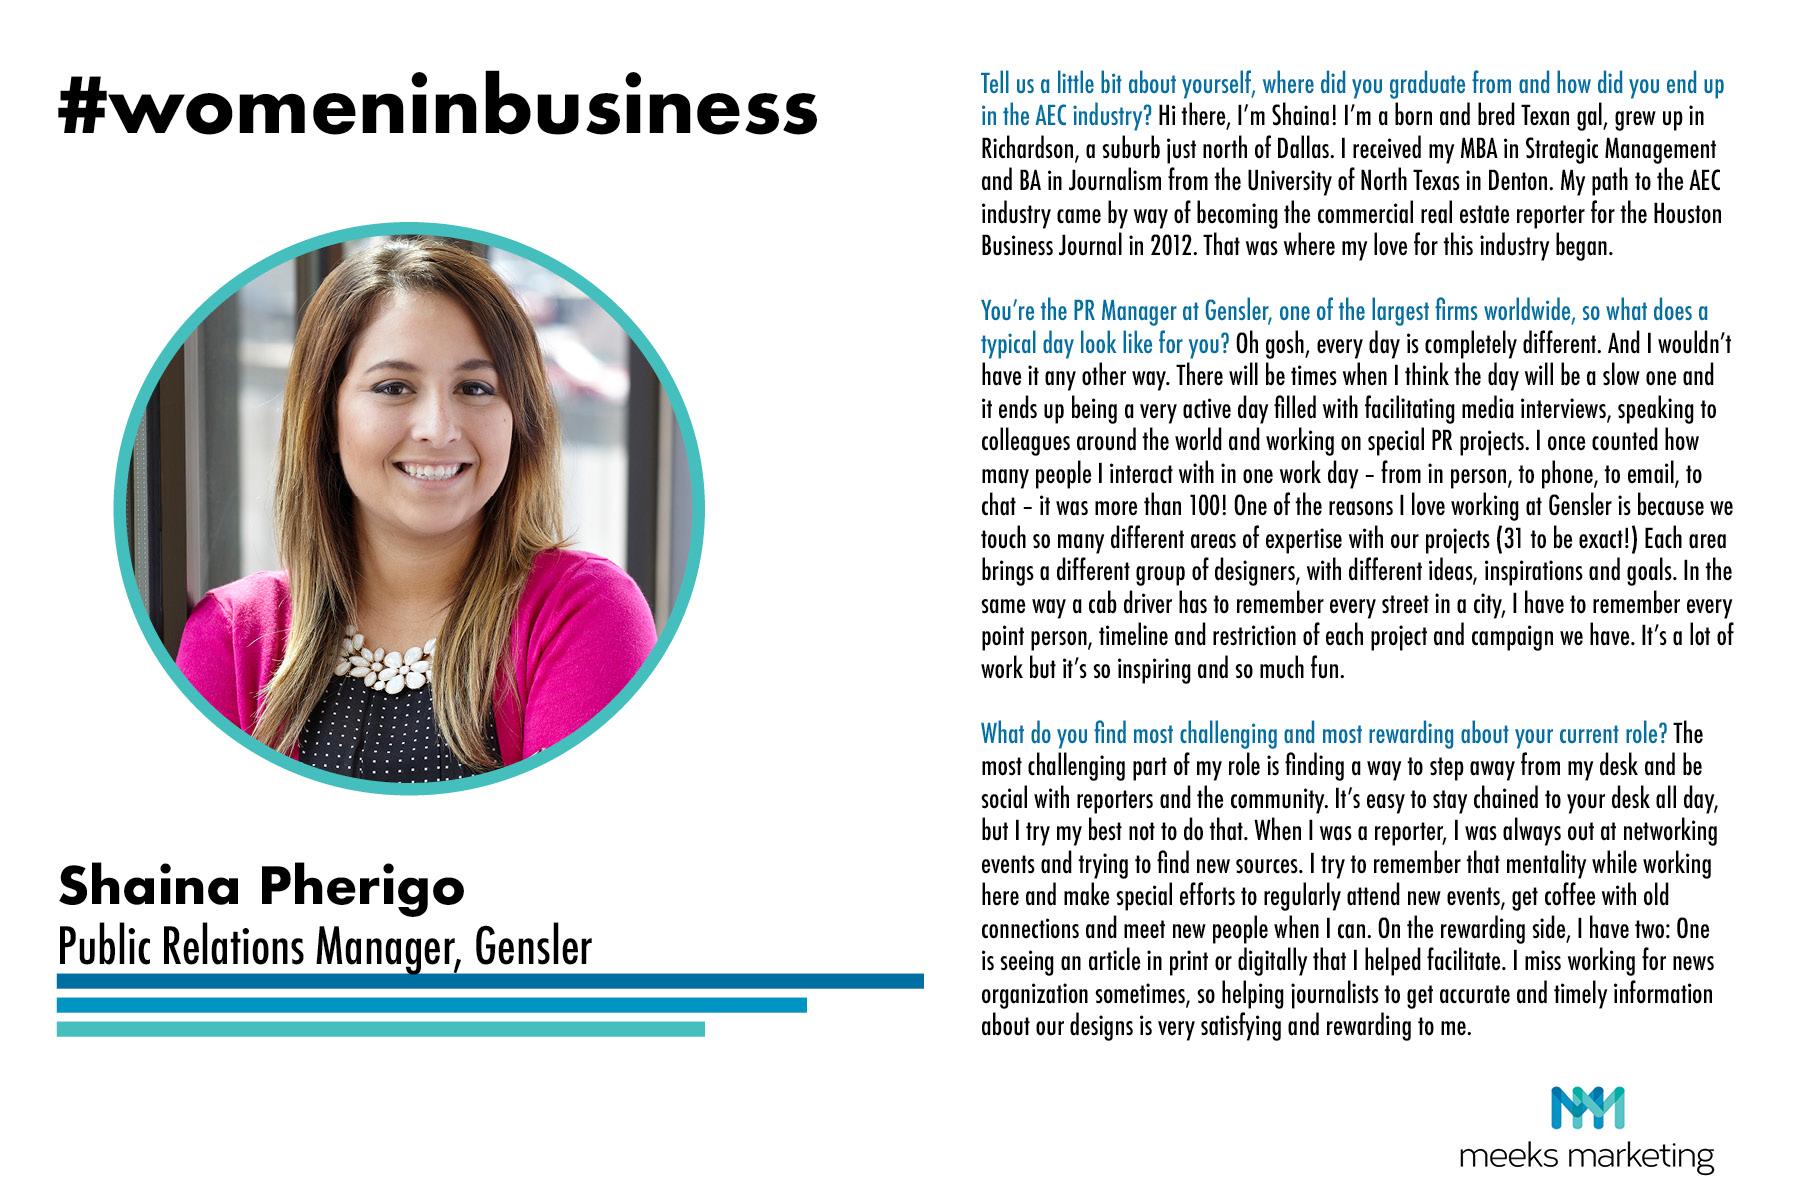 Women in Business_Shaina Pherigo.jpg